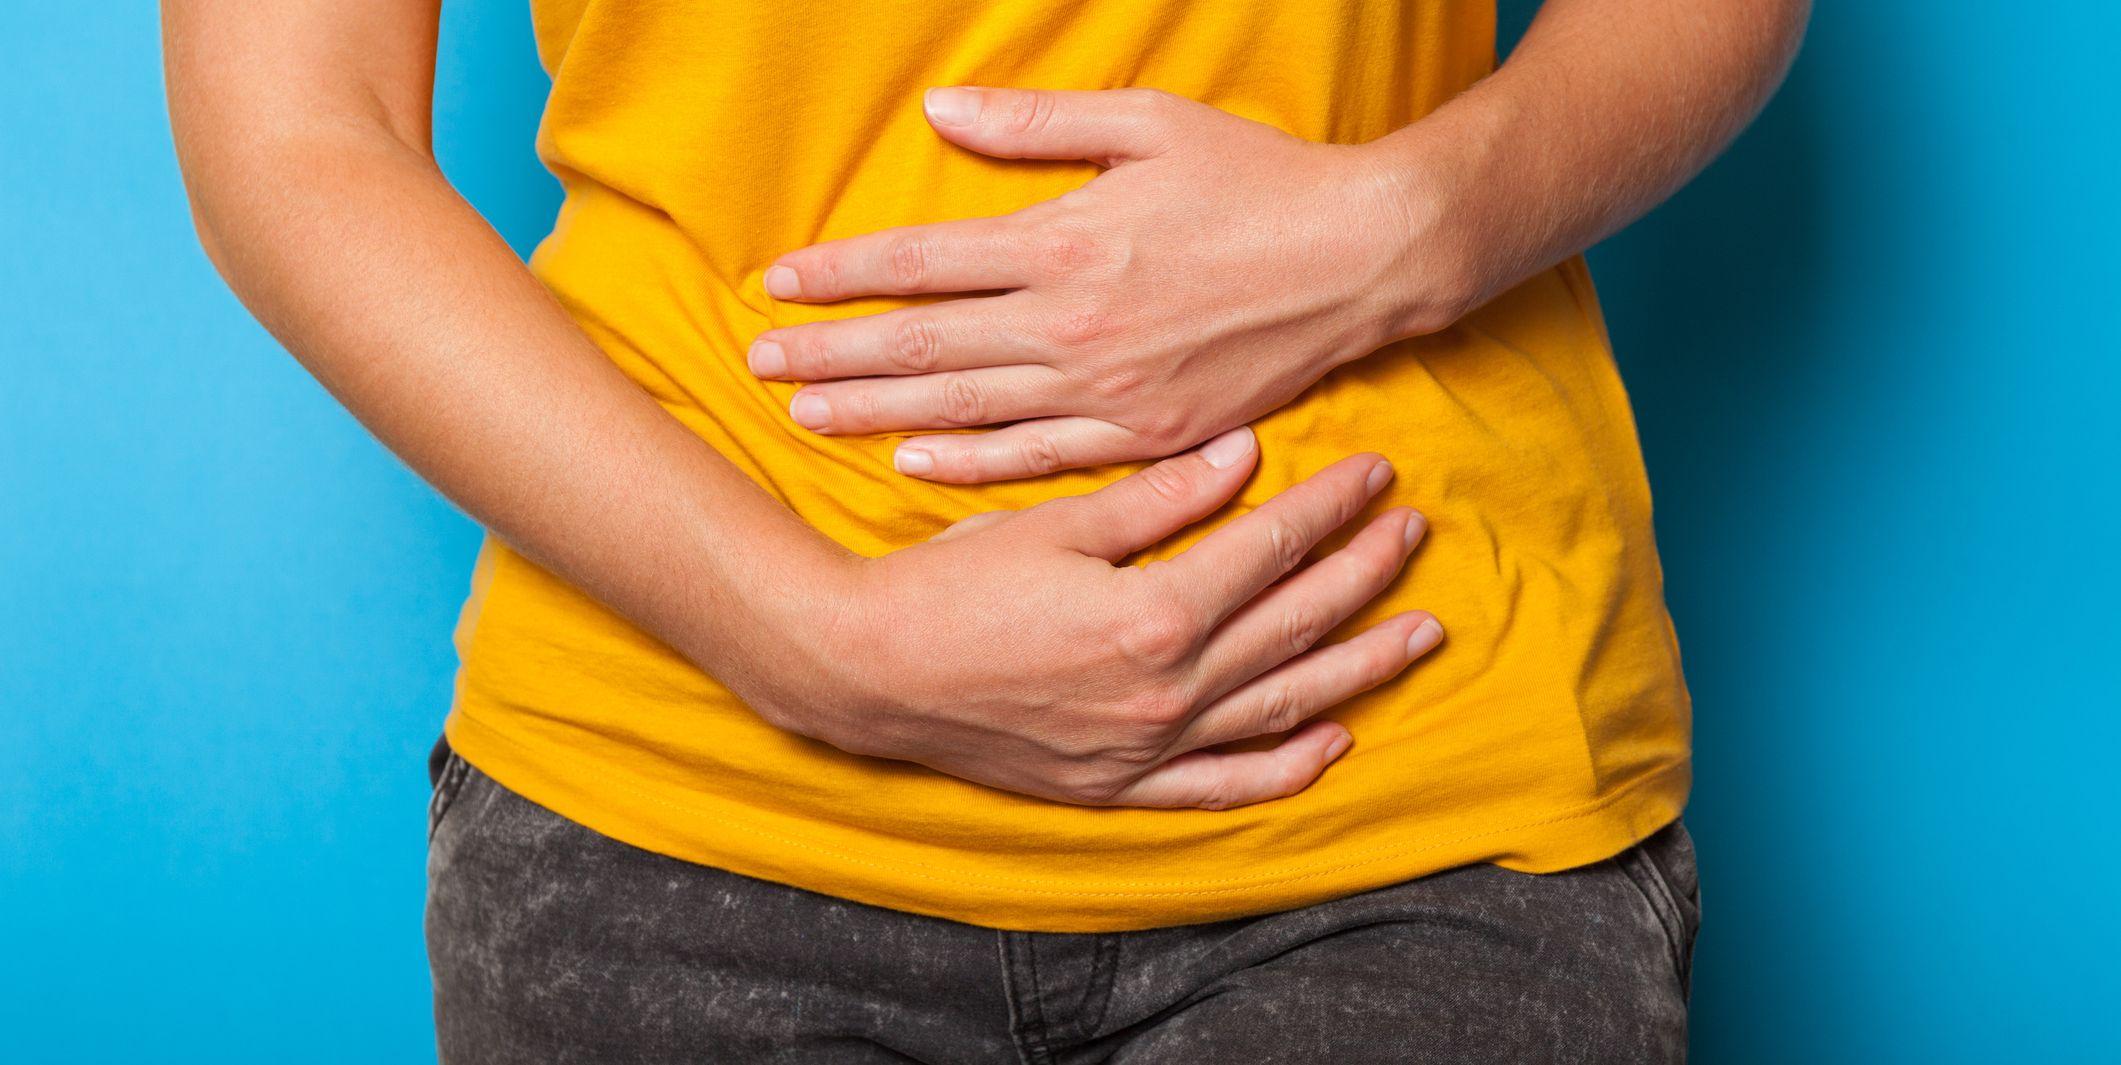 Pms pain, stomach ache. Endometriosis syndrome, diarrhea concept